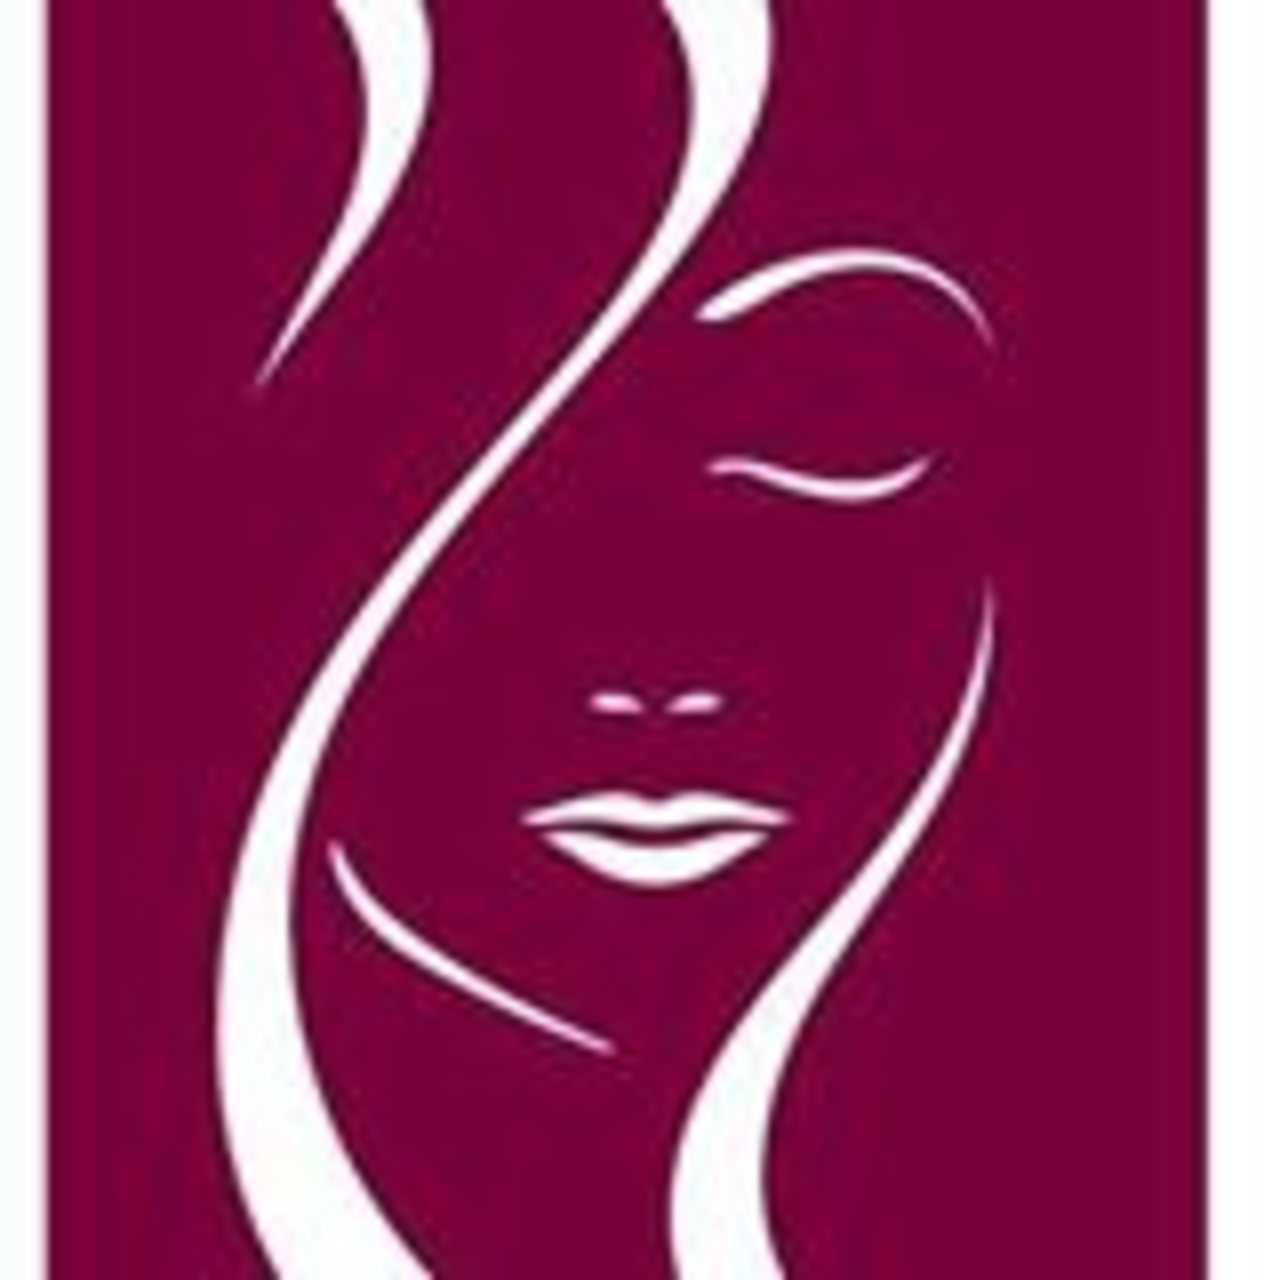 Hillstrom Wright Plastic Surgery - Medical - Plastic Surgery in Sarasota FL